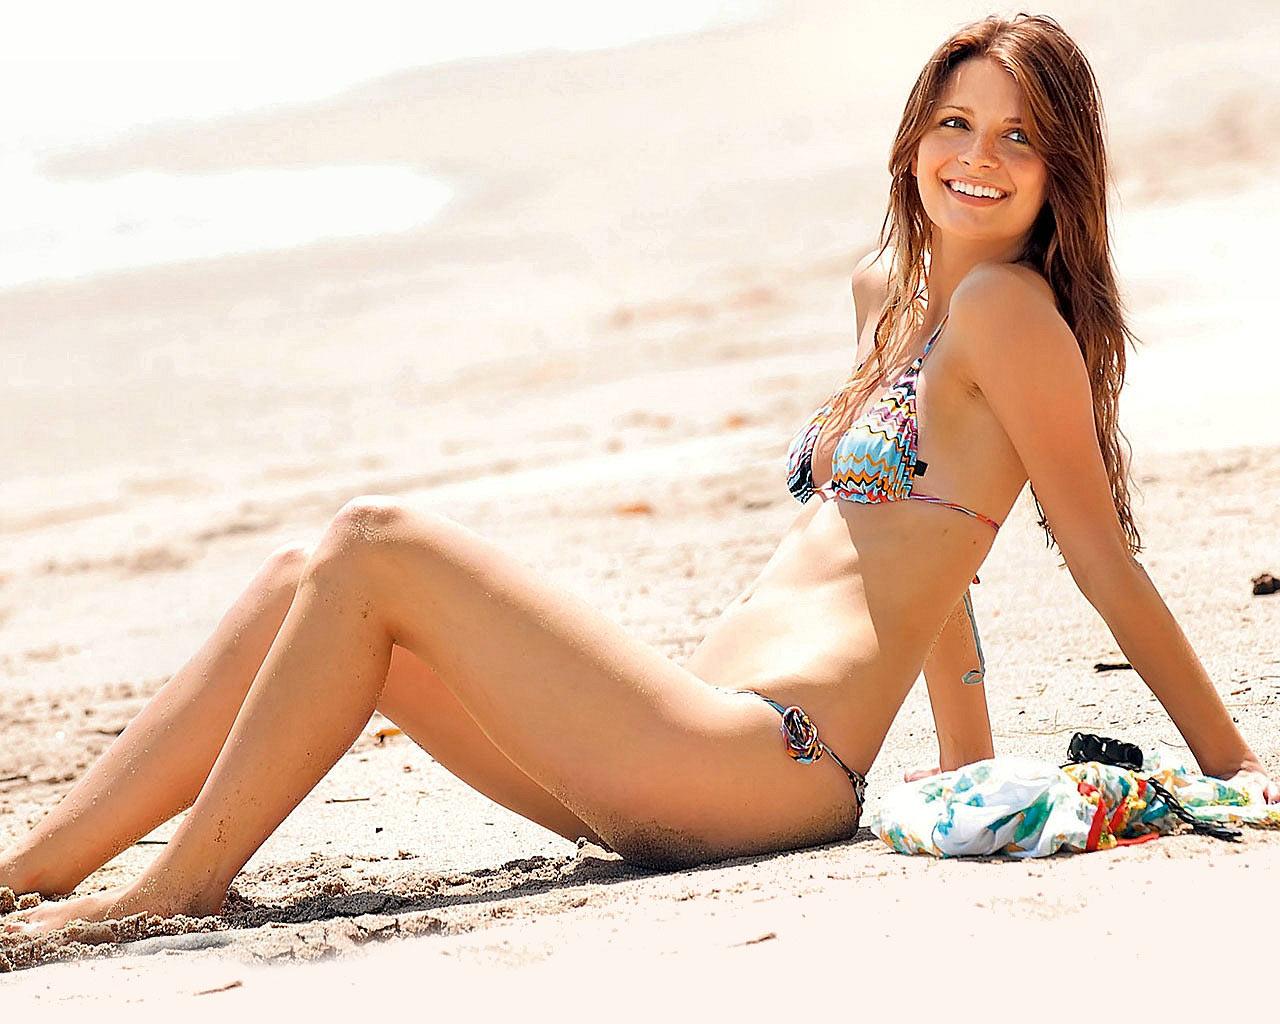 http://3.bp.blogspot.com/_FTuHFEQovqw/TSSsg2RAlII/AAAAAAAACb4/ScFouD13faI/s1600/Jennifer+Aniston+bikini+hot+sexy+picture+%2526+biography+profile17.jpg